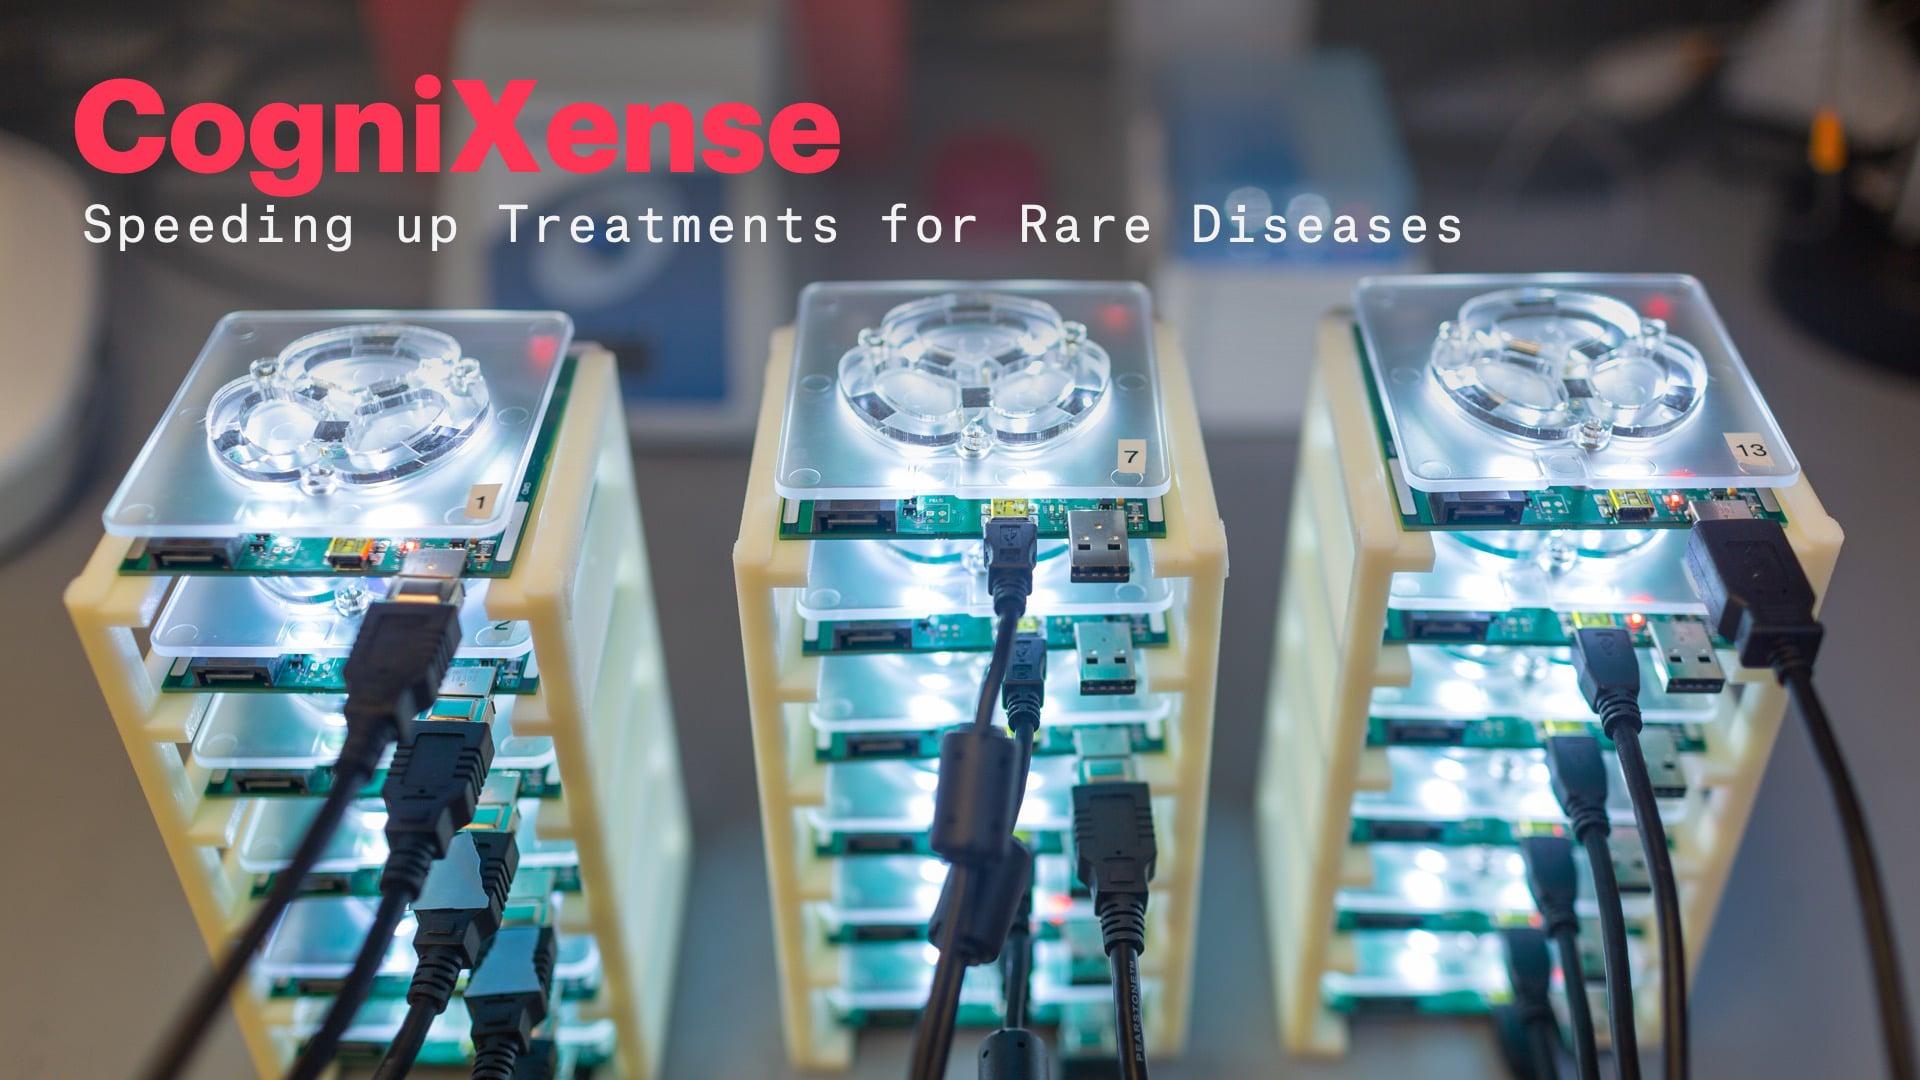 CogniXense: Speeding Up Treatments for Rare Diseases